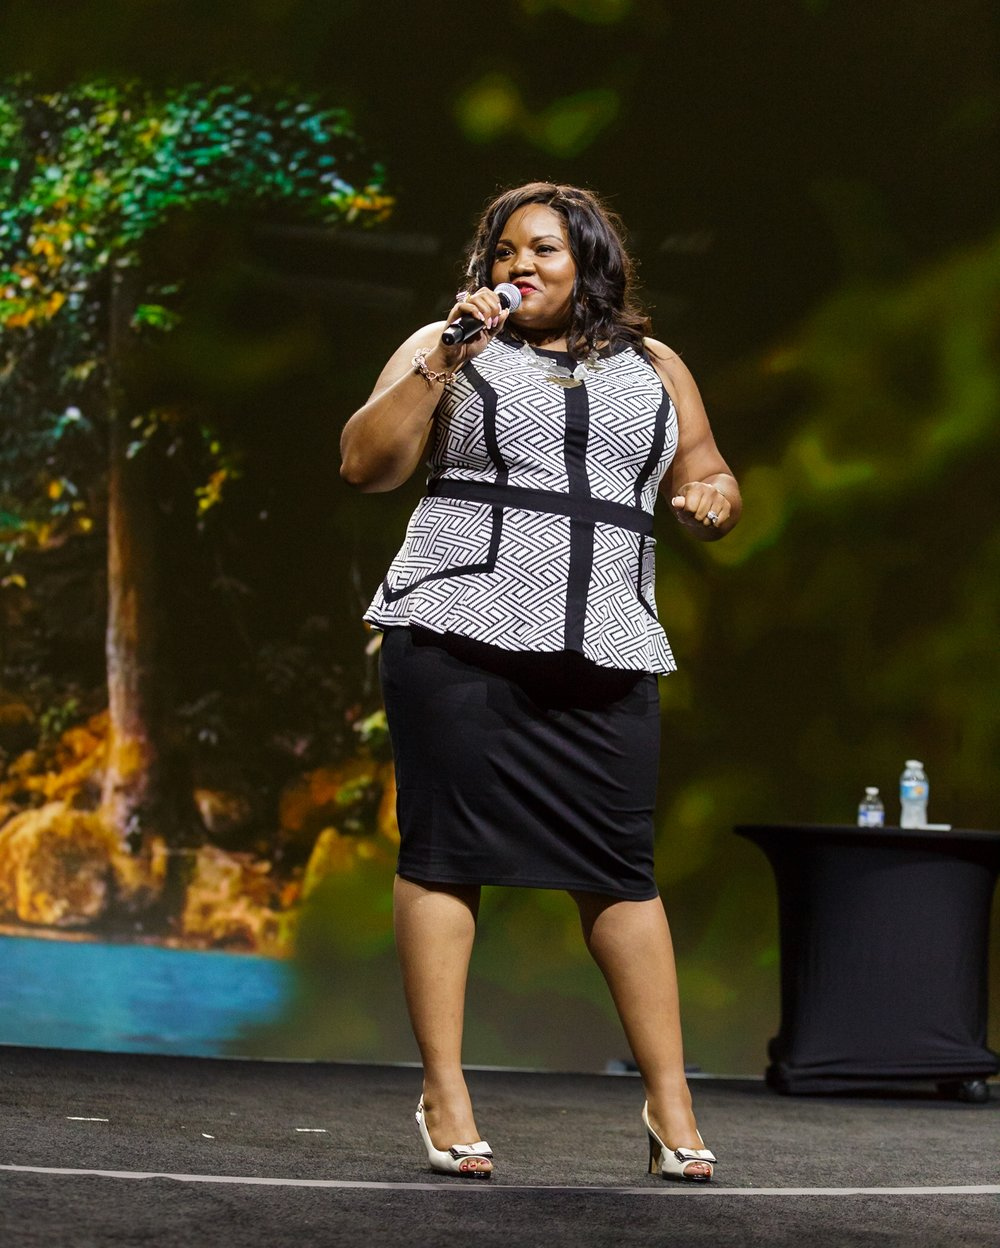 Amelia Mimi Brown motivational speaker